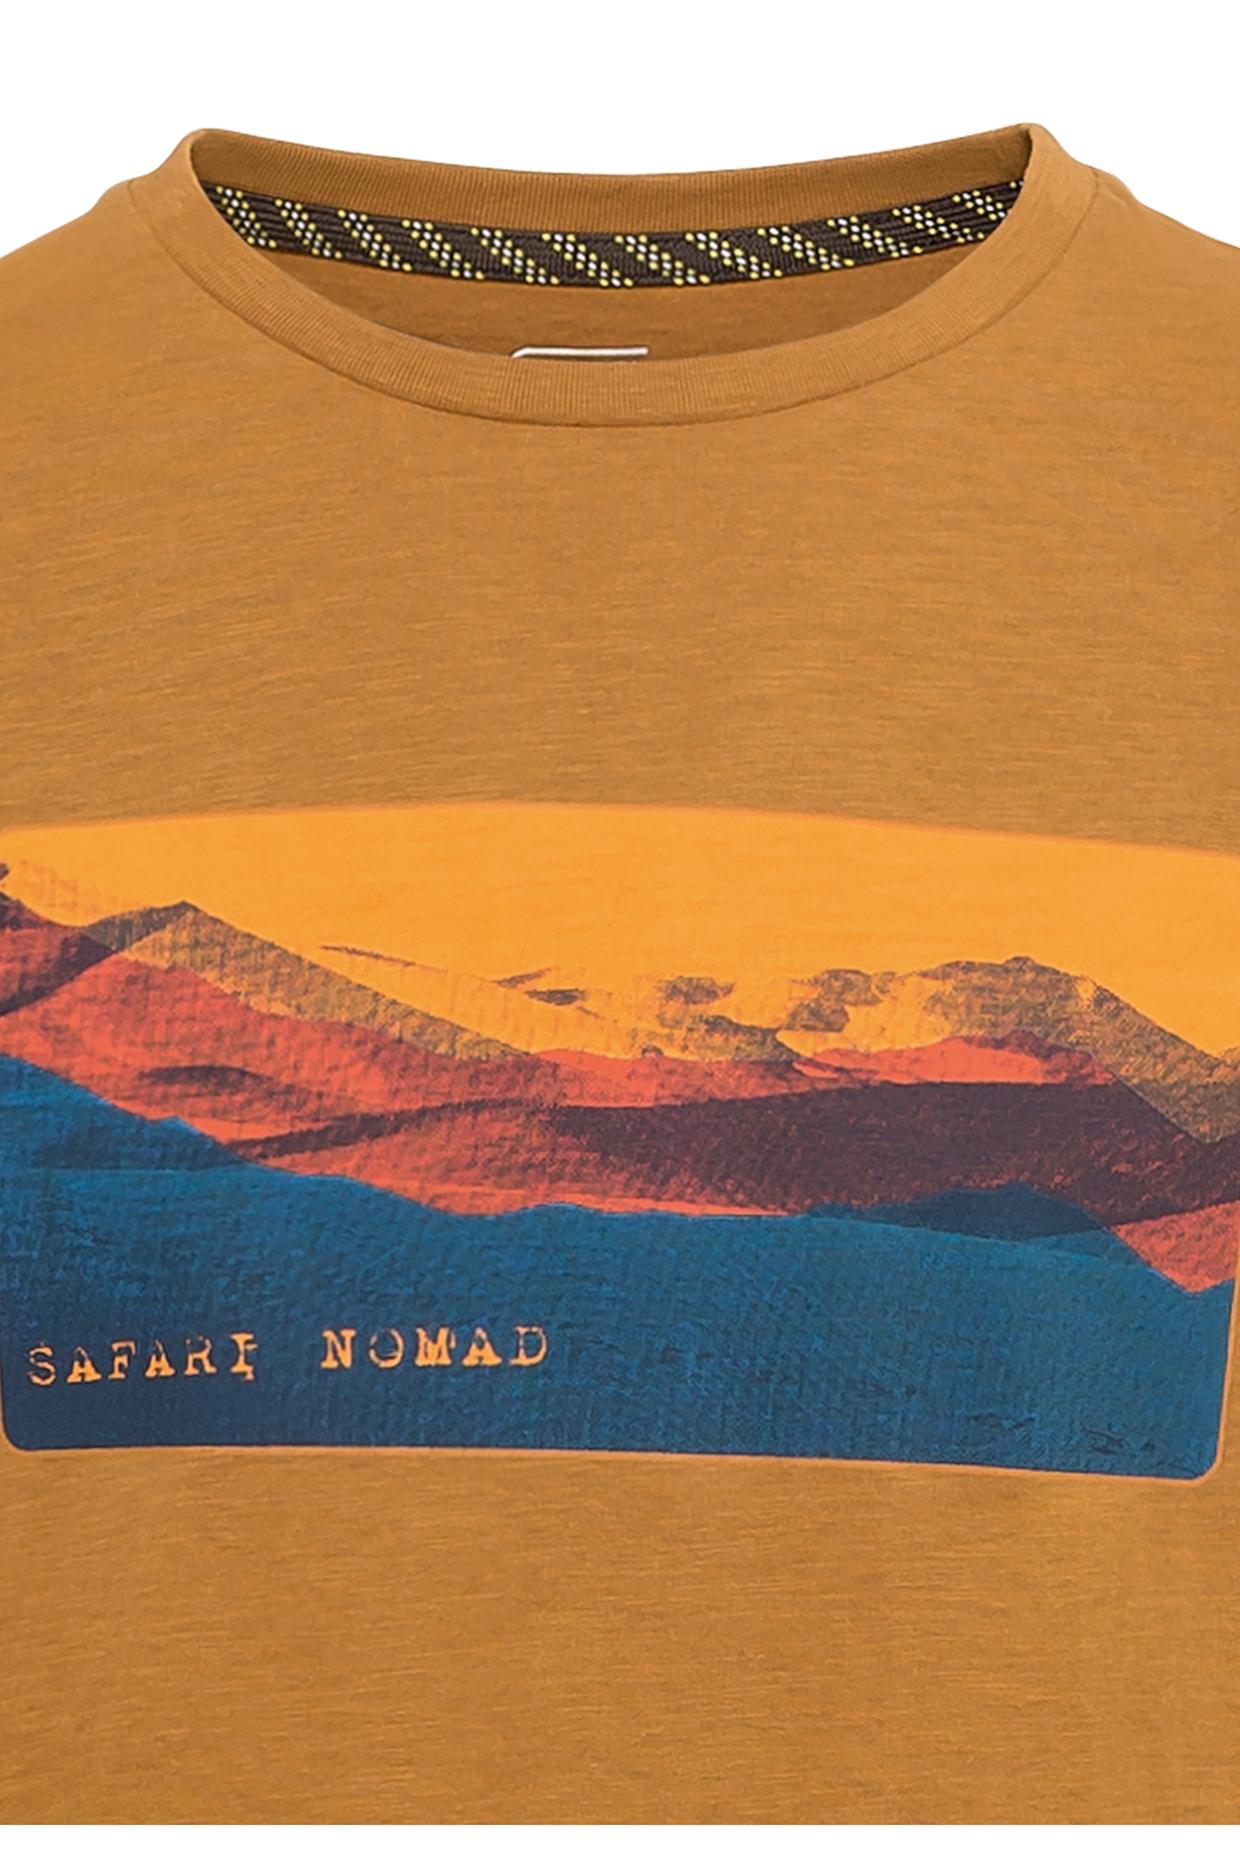 Camel active T-Shirt gelb Print 5T42409642 23